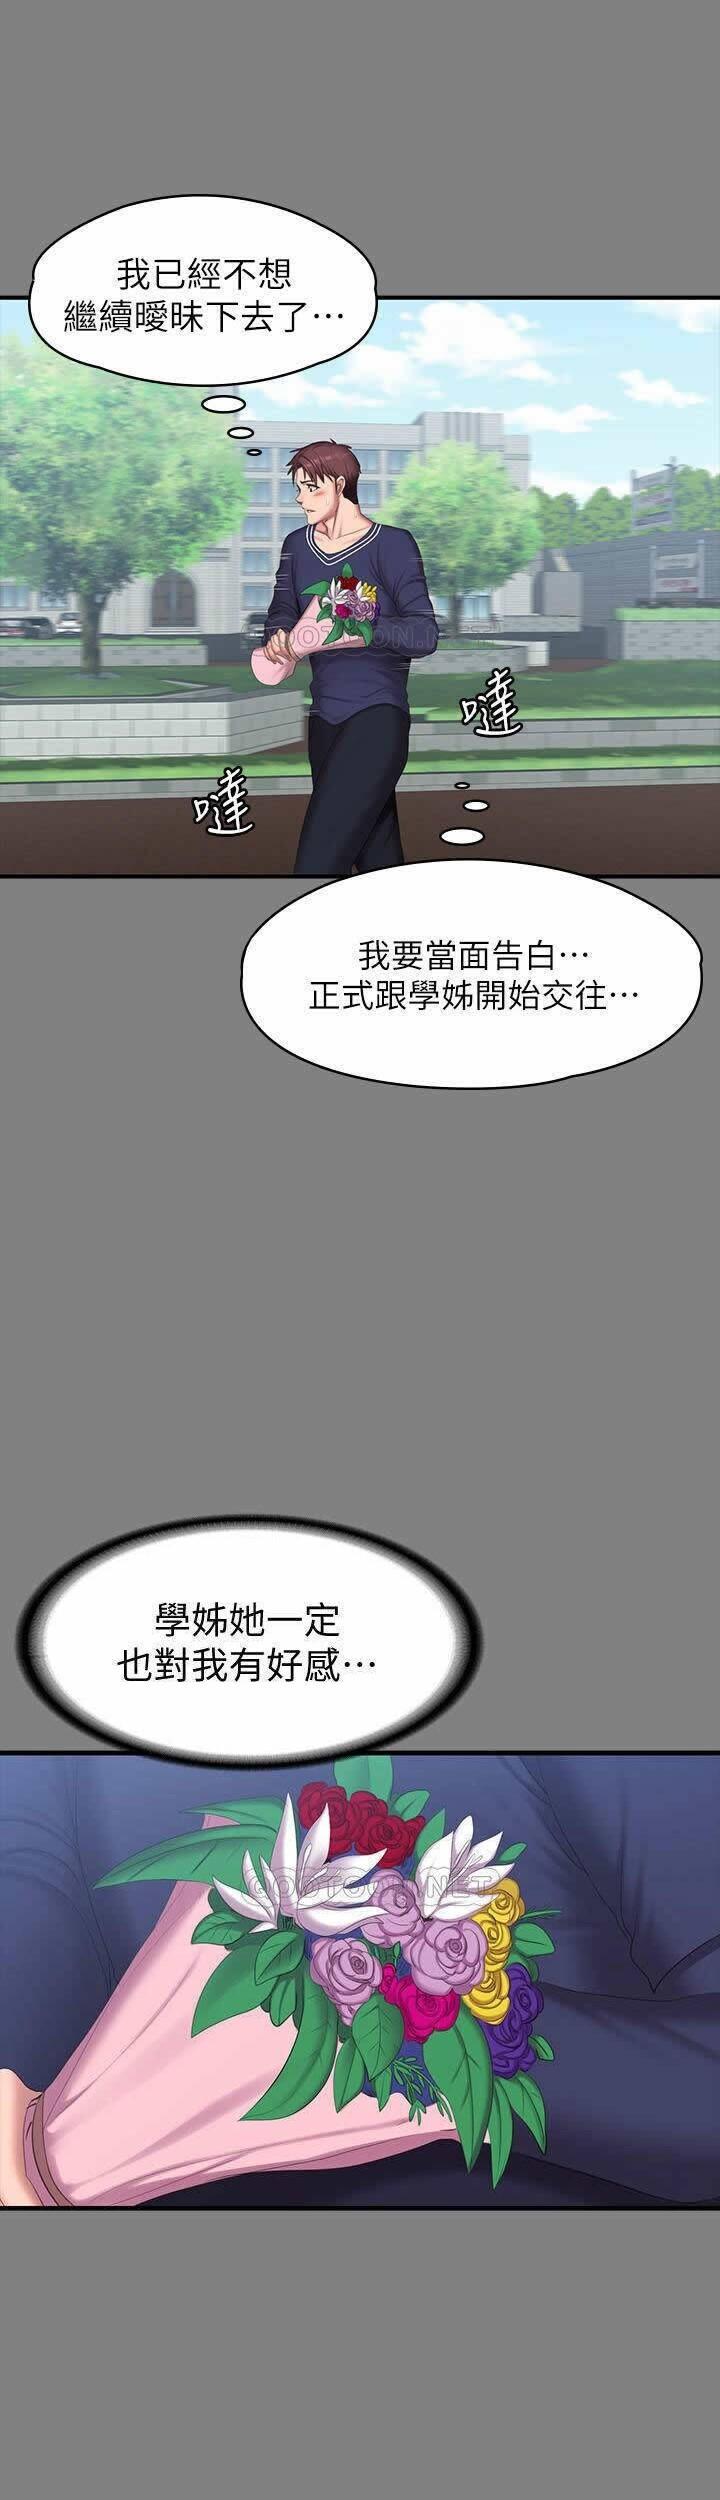 FITNESS 61-88 CHI 190